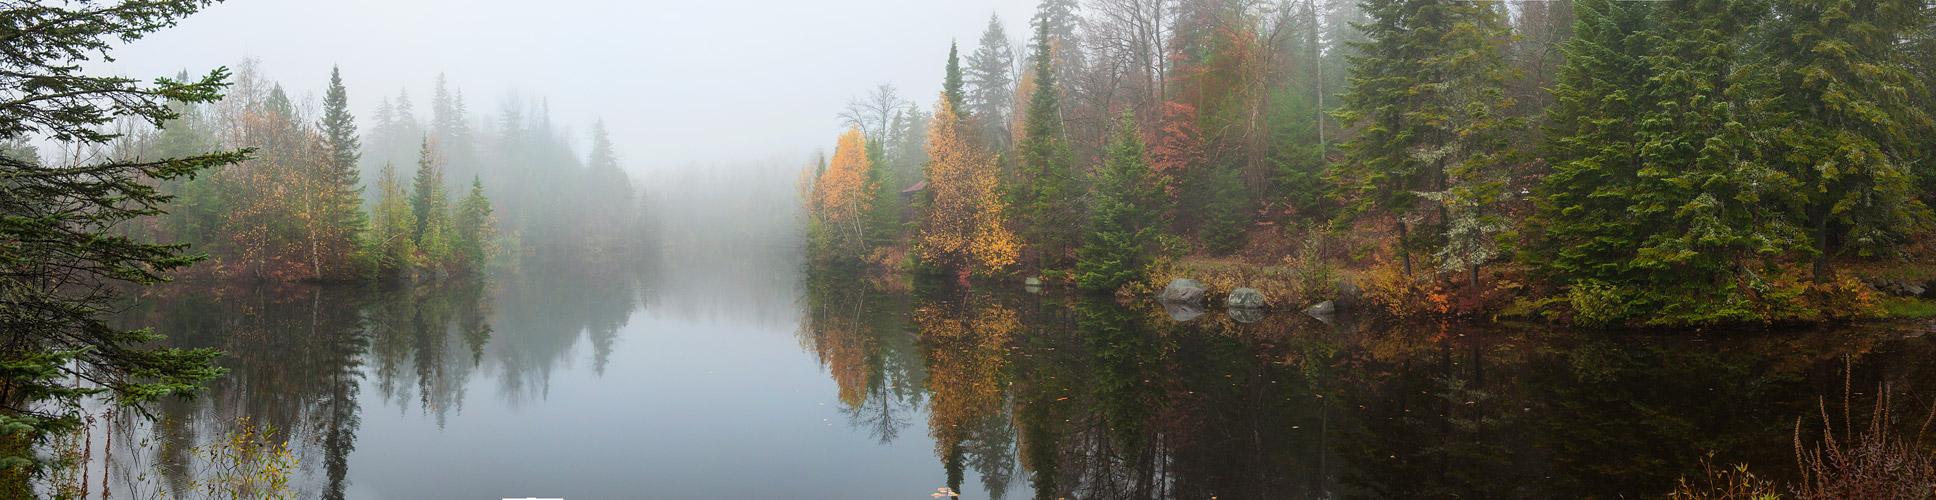 Kio-o-lac-automne-brouillard.jpg